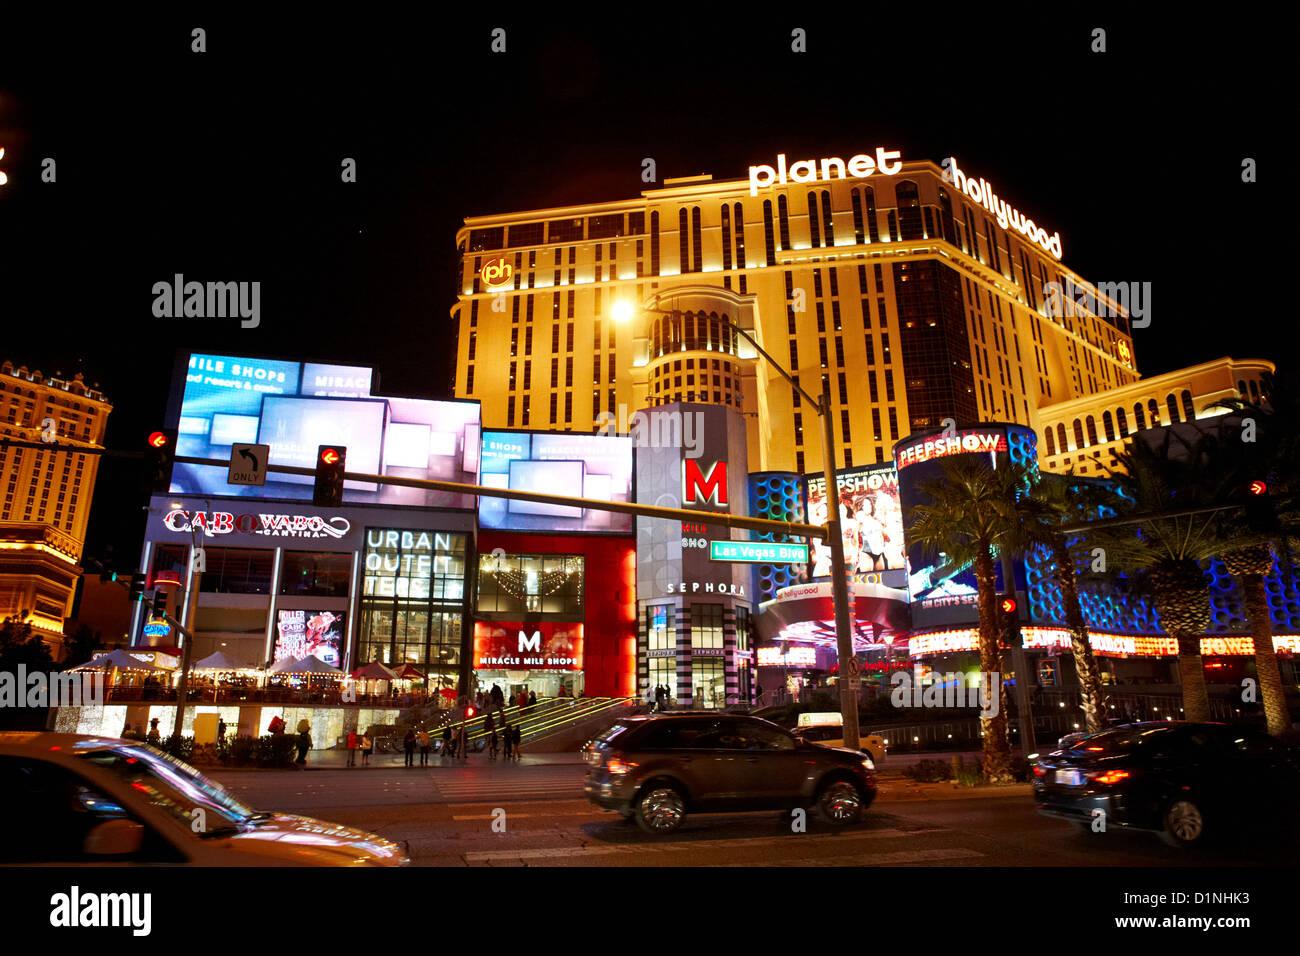 Planet Hollywood Las Vegas Hotel Stock Photos & Planet